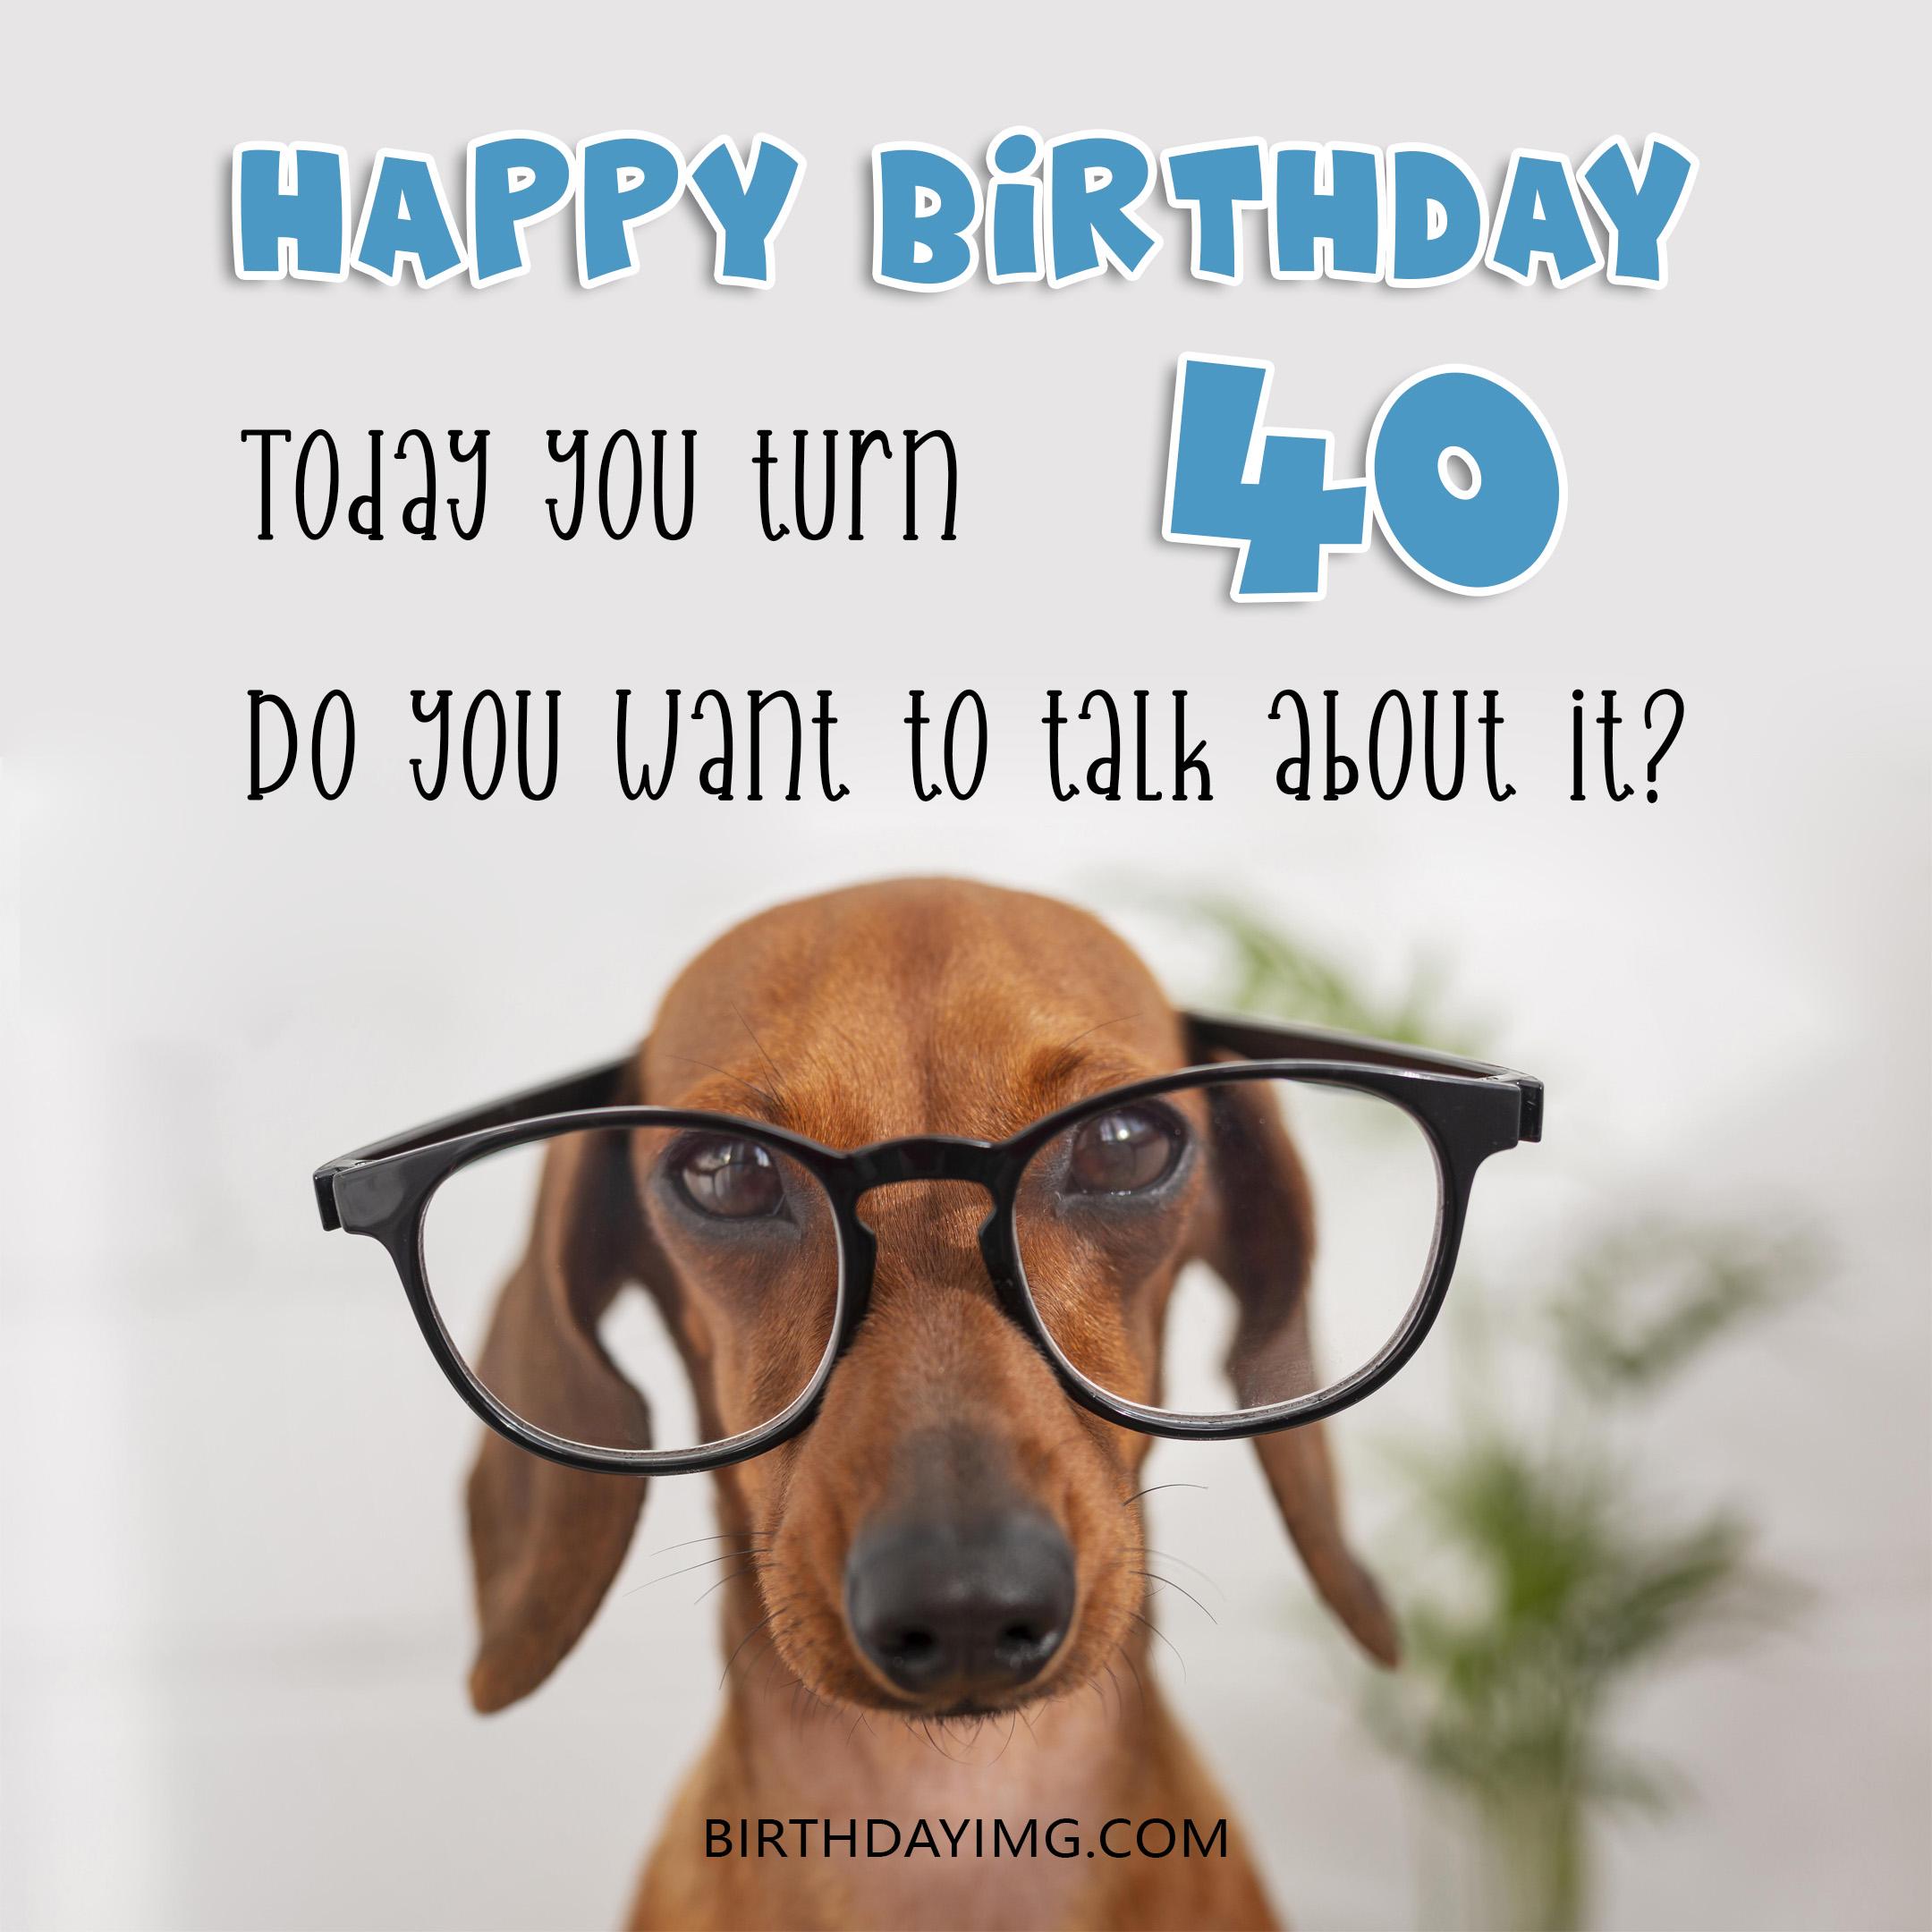 Free 40th Years Happy Birthday Image With Funny Dog - birthdayimg.com